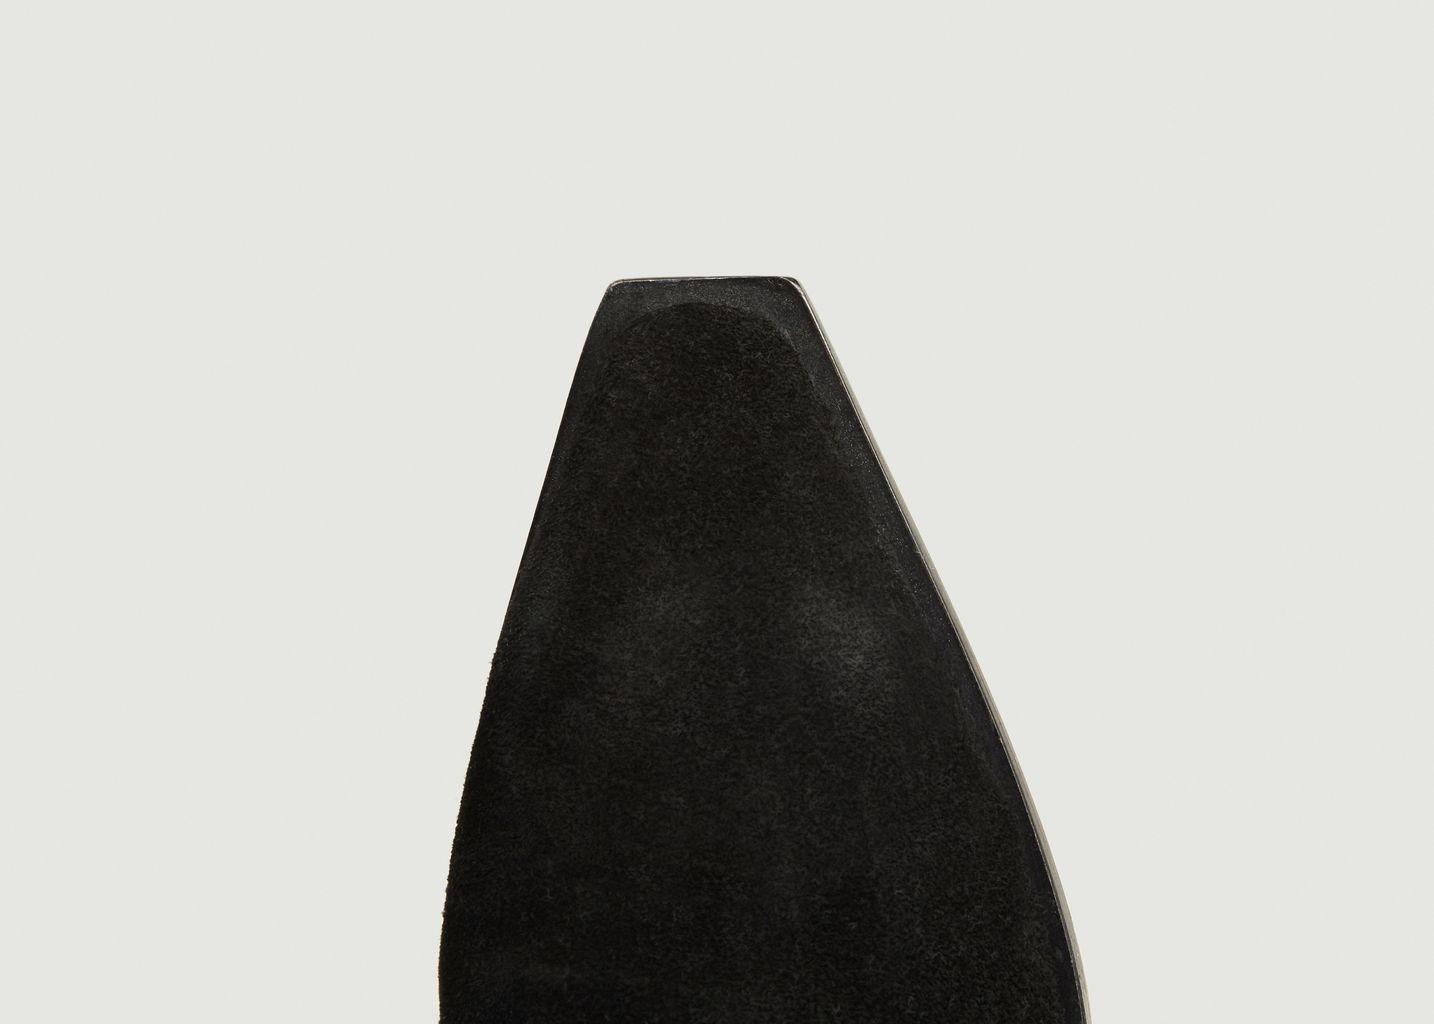 Boots Bea Daim Black  - Aeyde